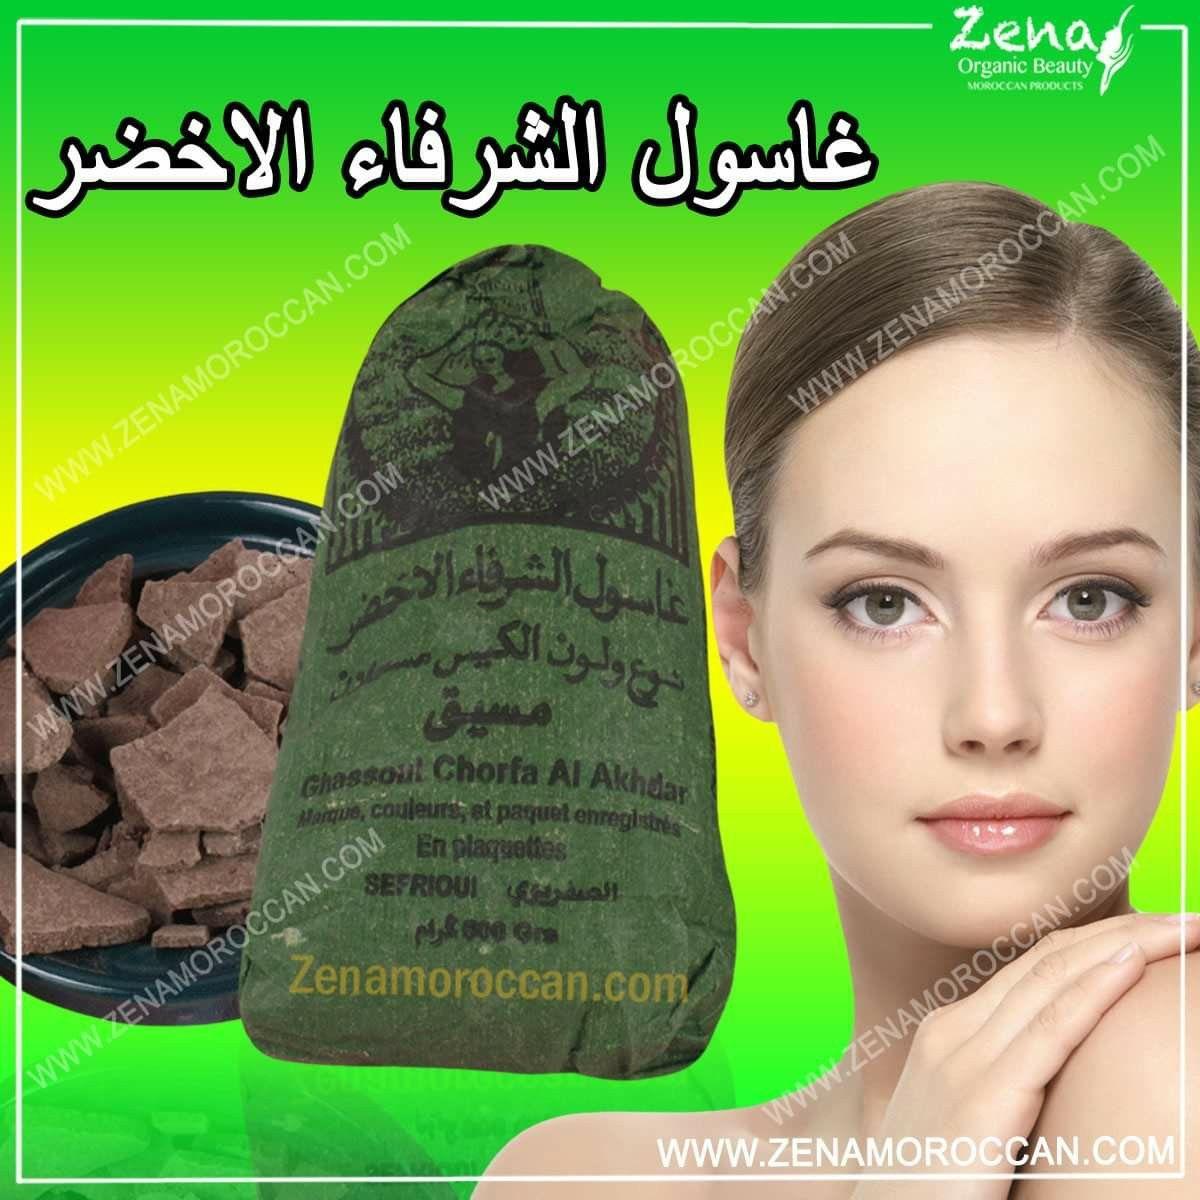 غاسول الشرفاء الاخضر Improve Skin Elasticity Natural Lotions Body Skin